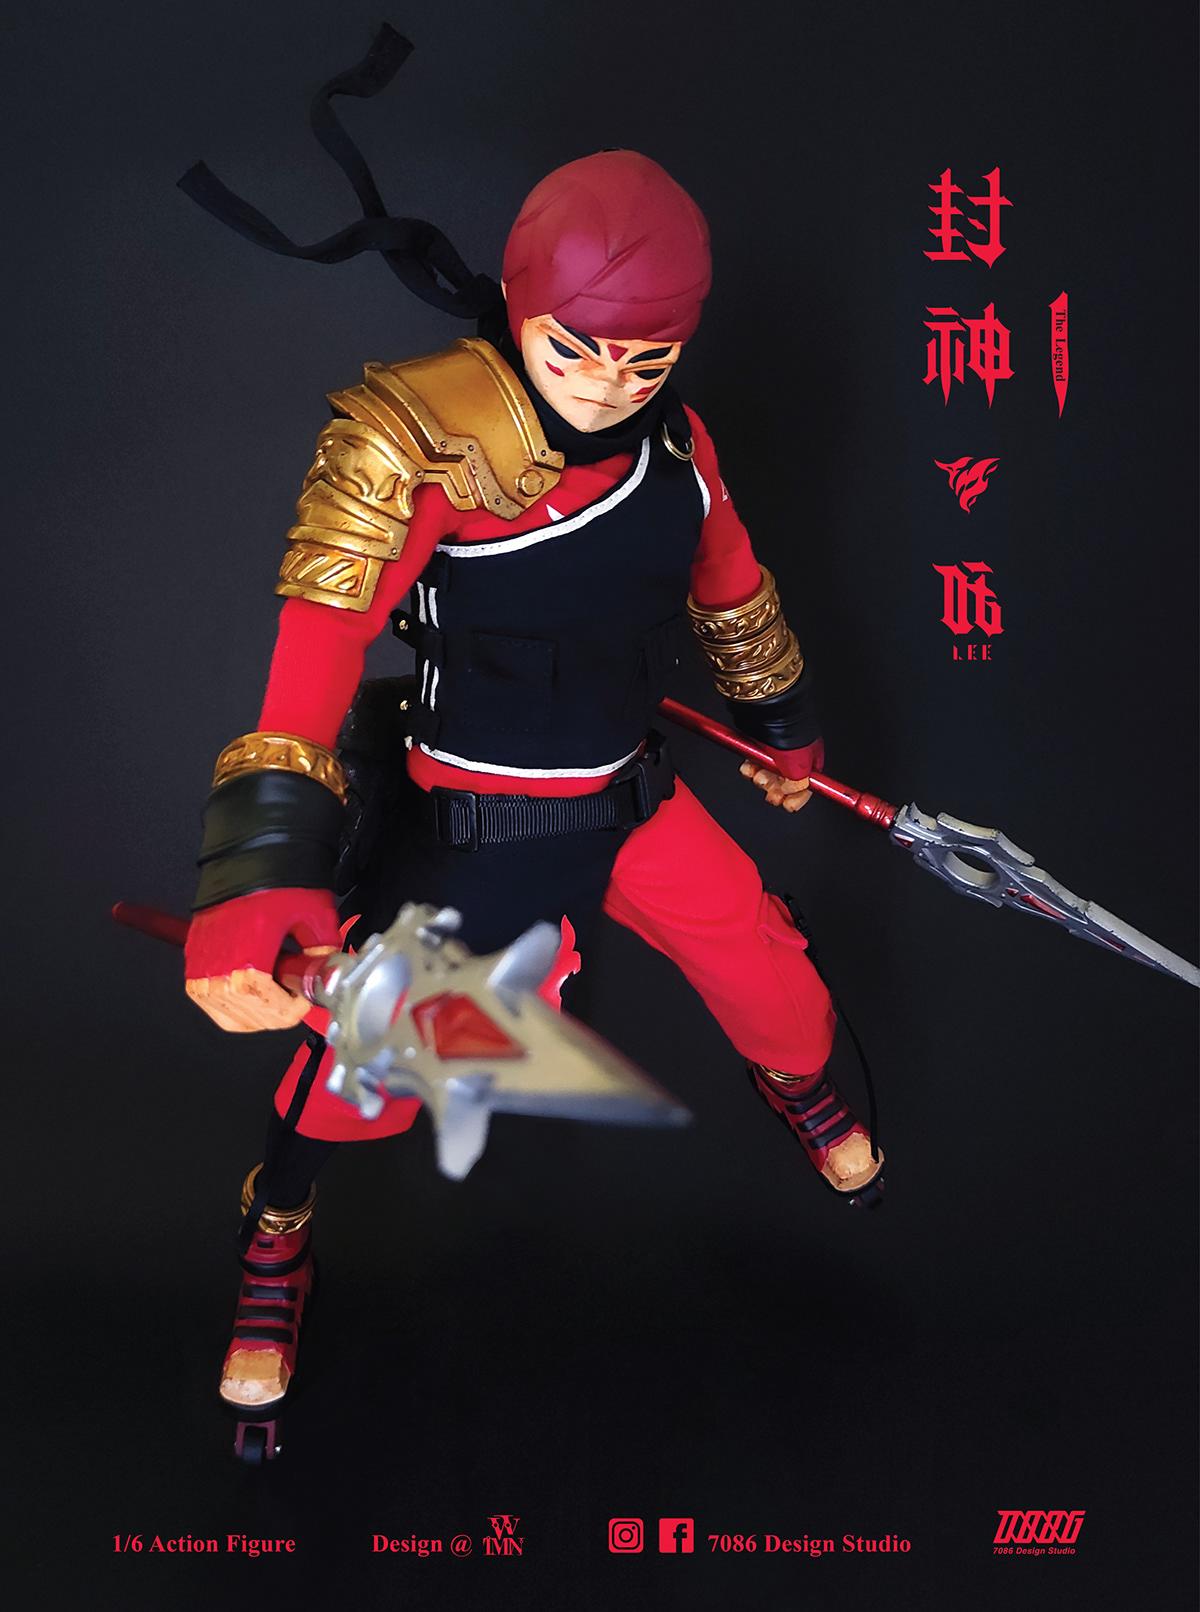 1/6 action figure 3D model Action Figure Character design  ILLUSTRATION  one sixth scale figure sculpture the legend toy toys design